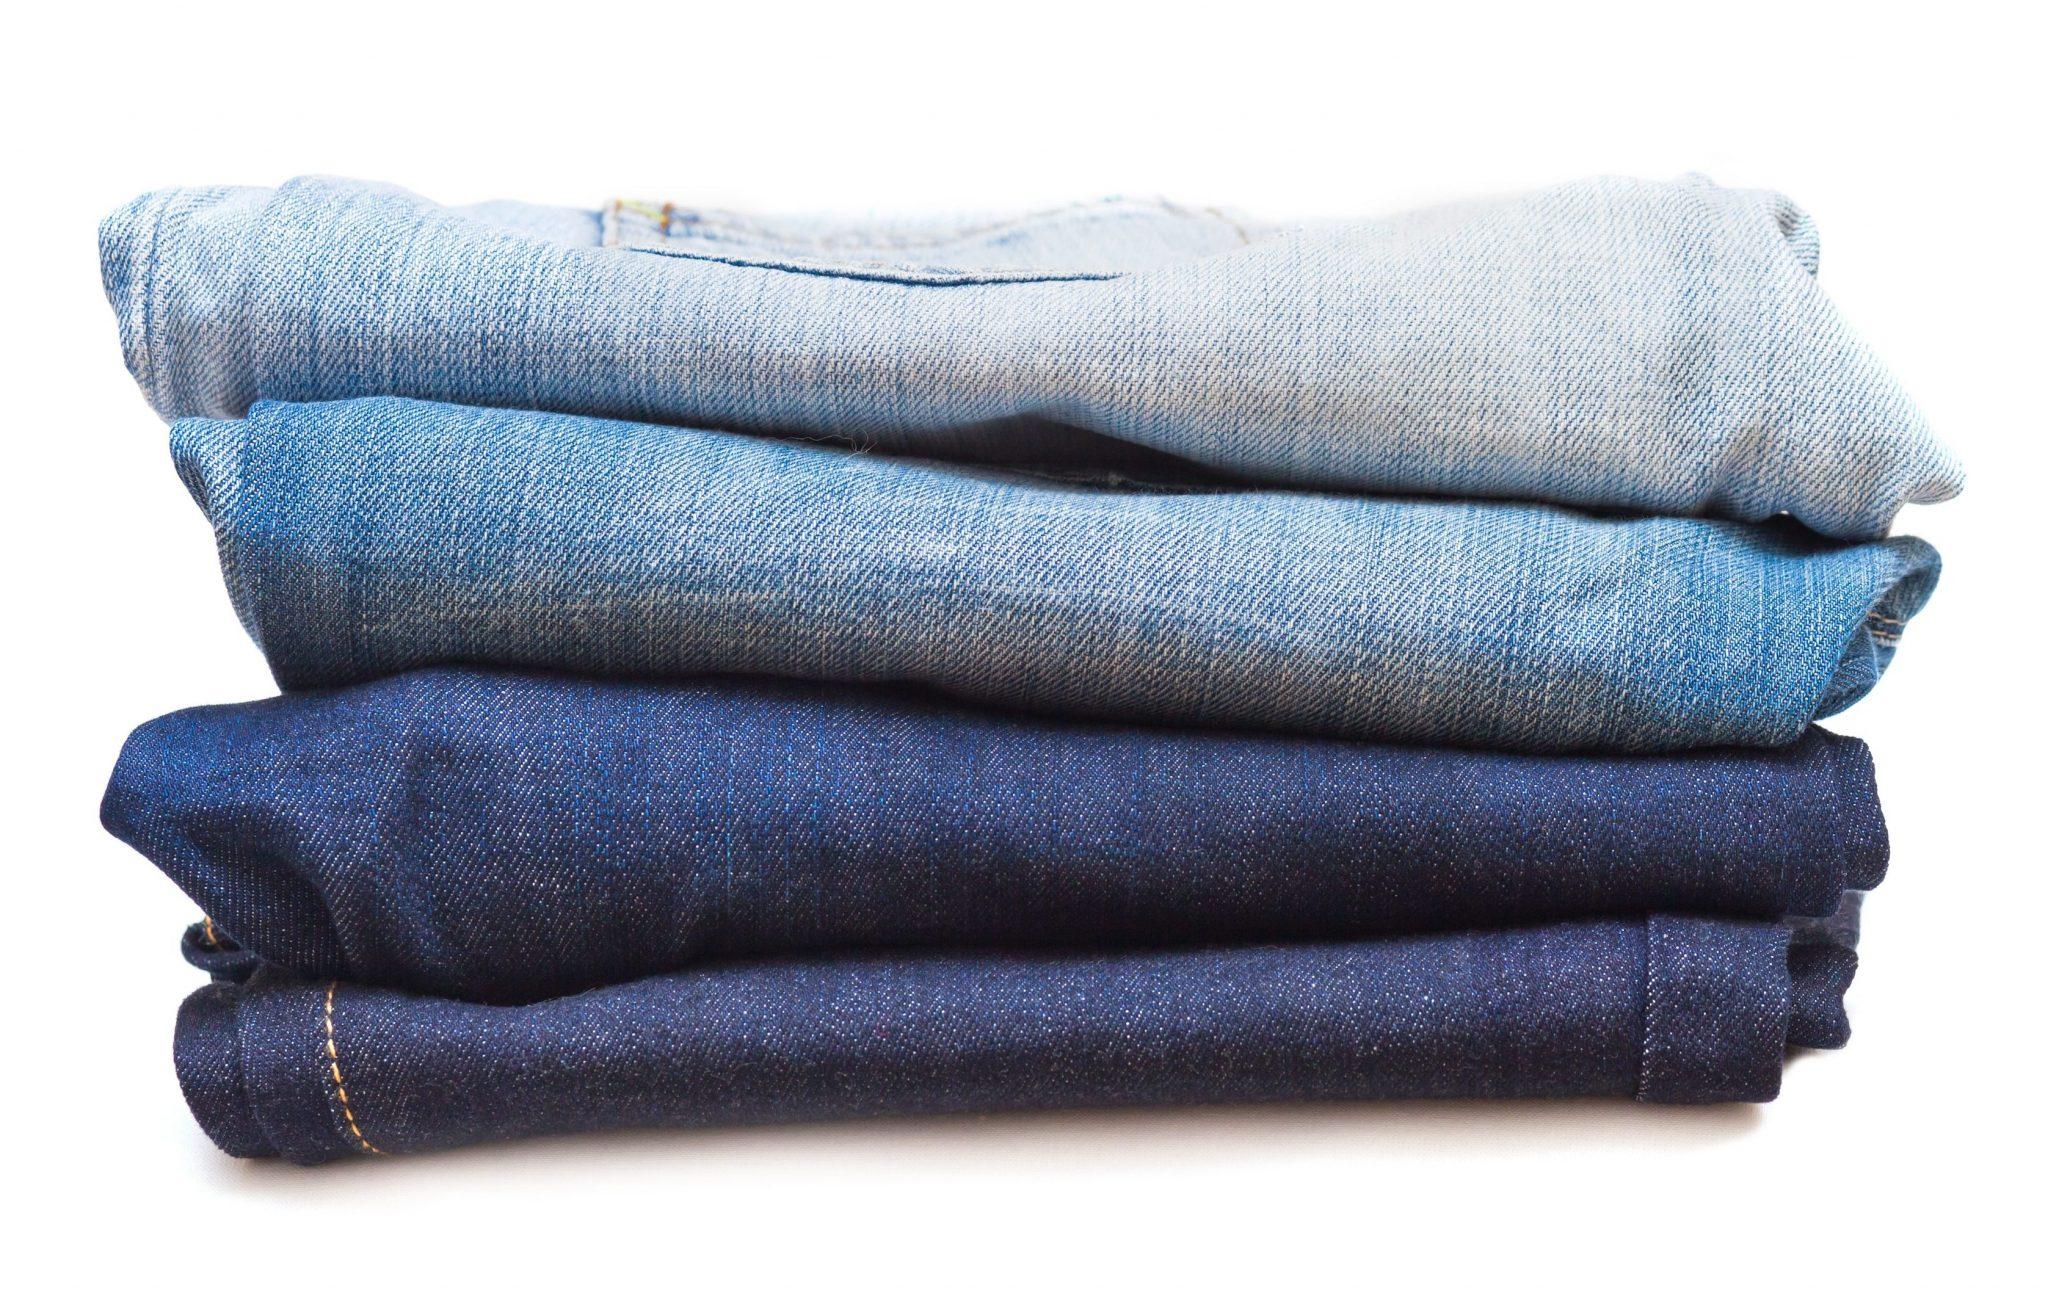 Stack of Jeans. Evgenia Bolyukh/Shutterstock.